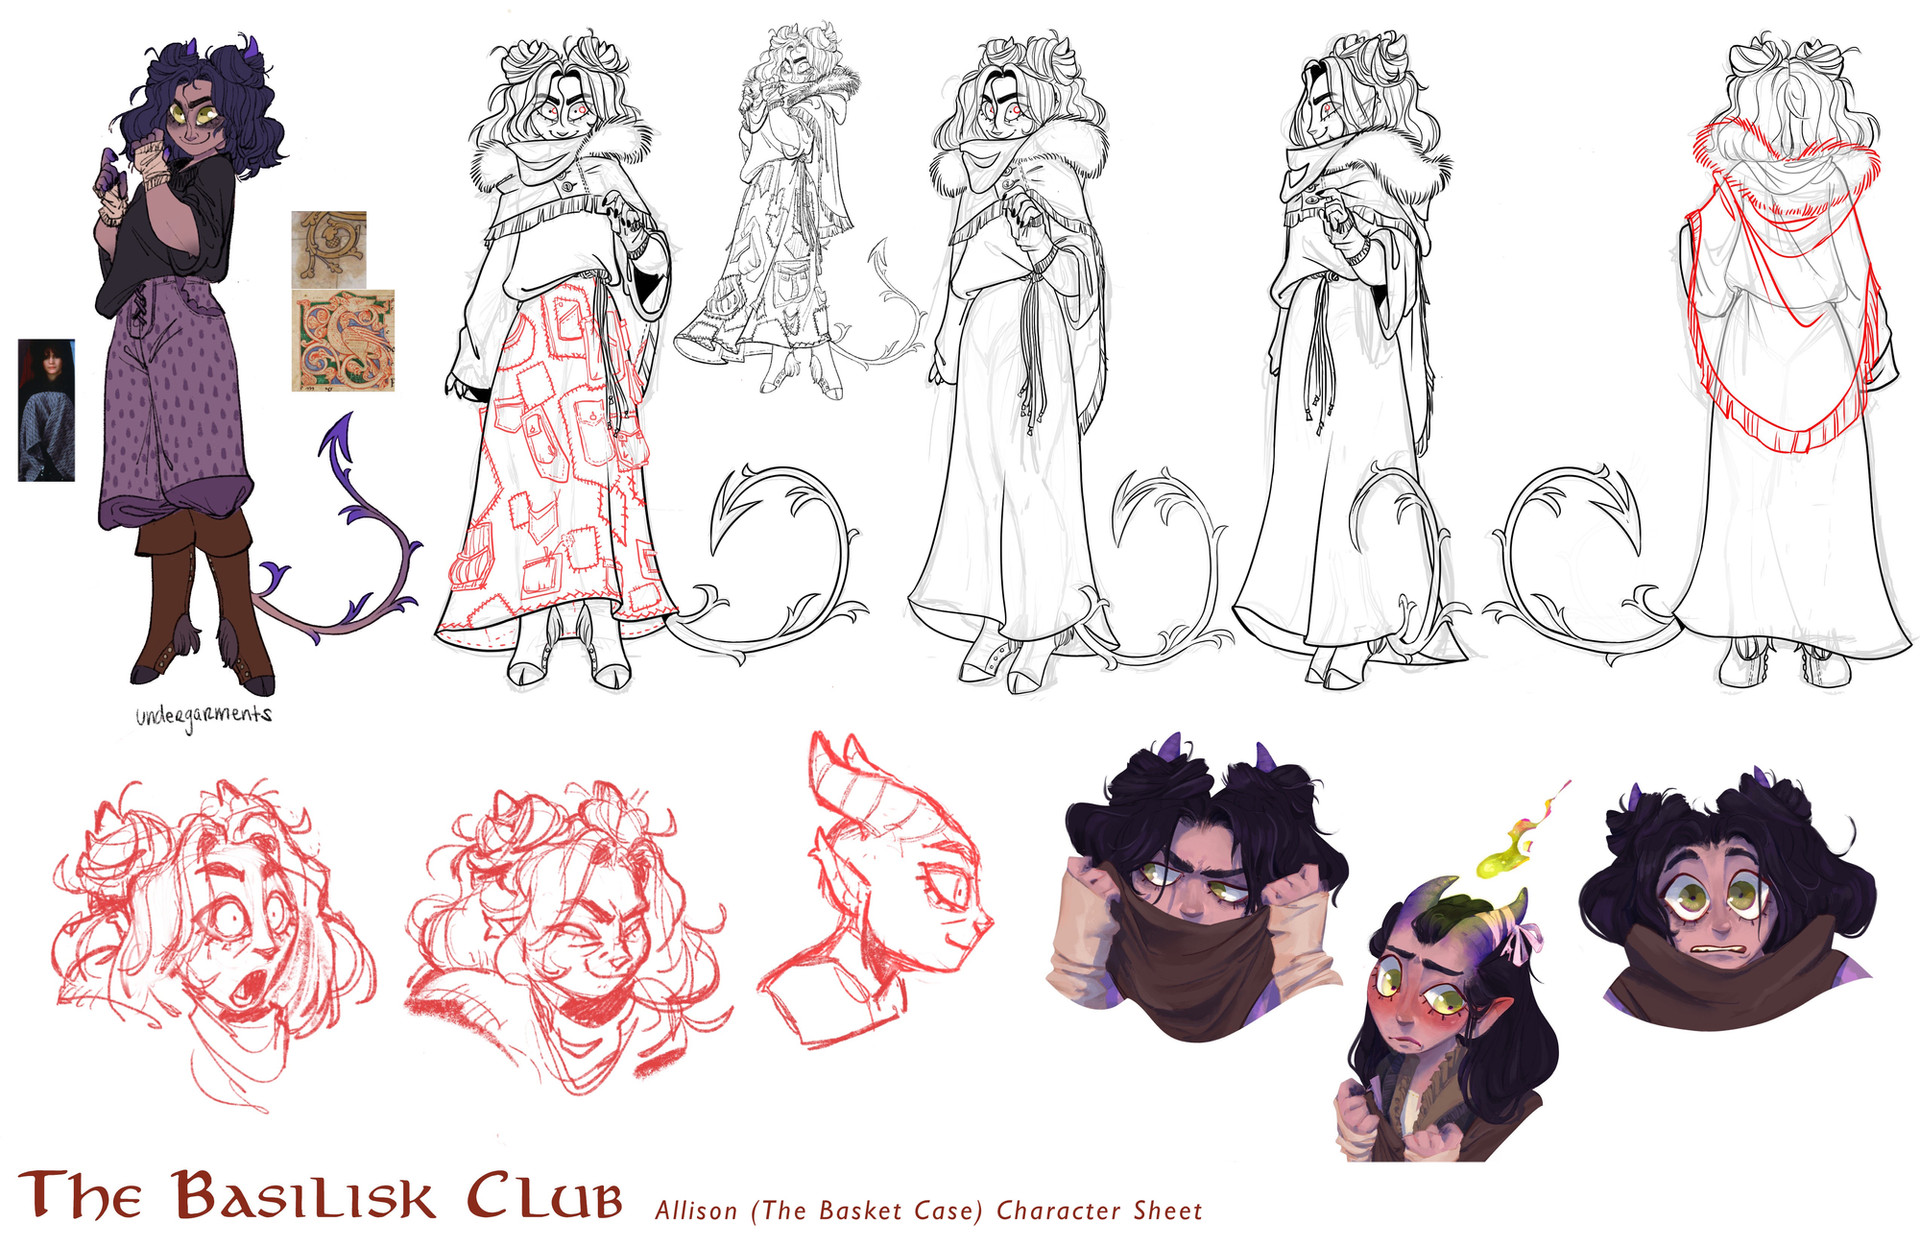 The Basilisk Club: Allison Character Sheet